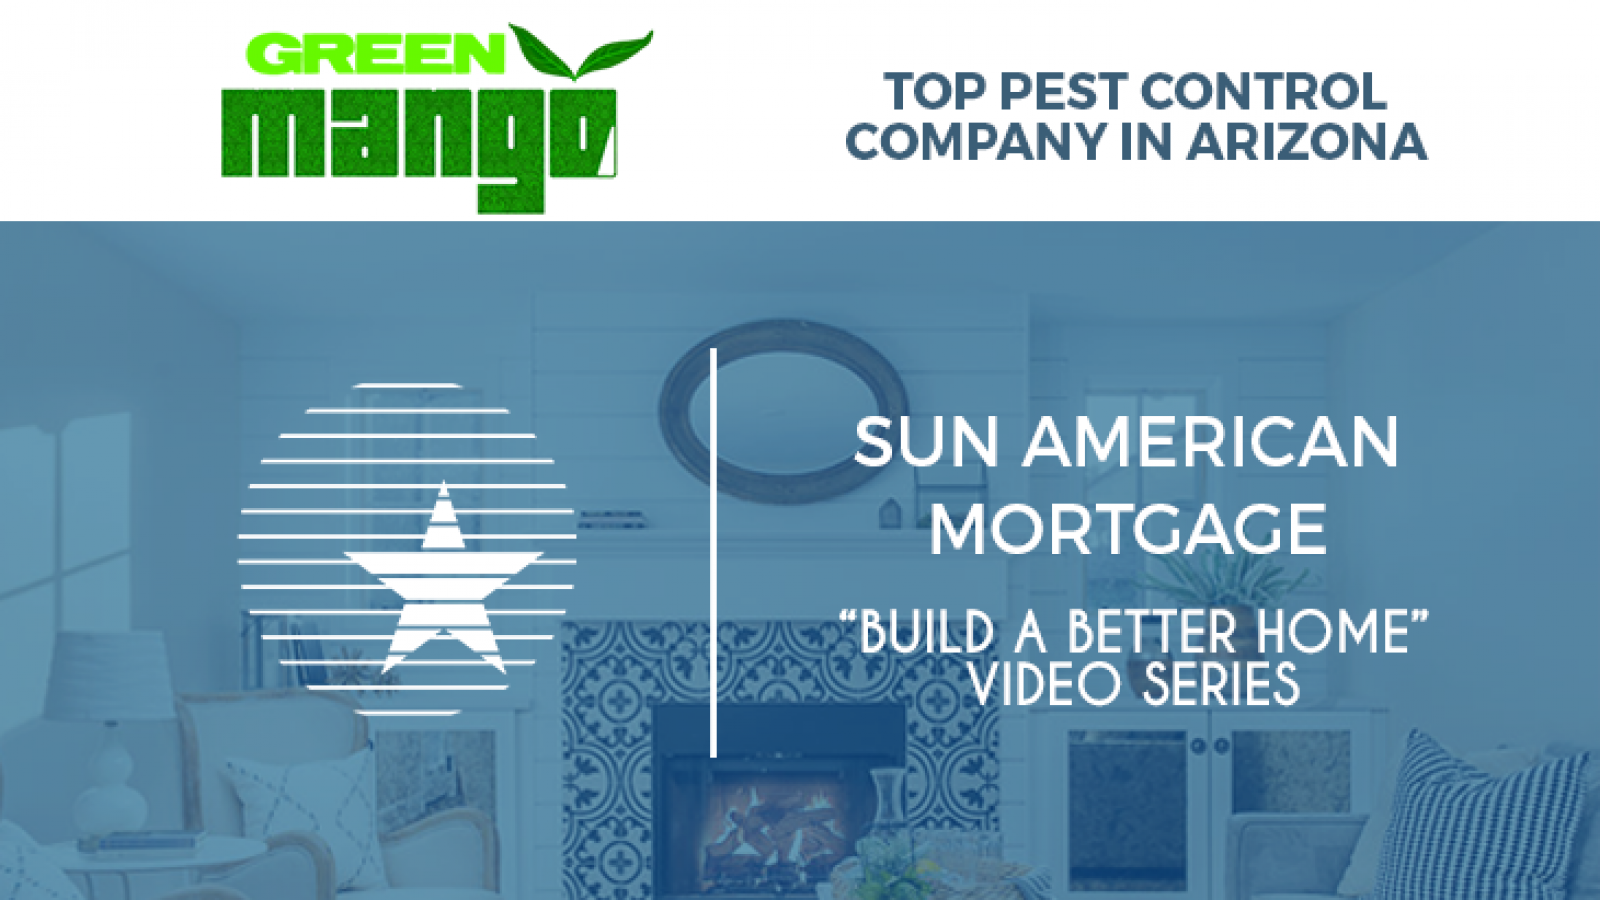 build a better home - green mango pest control - feature